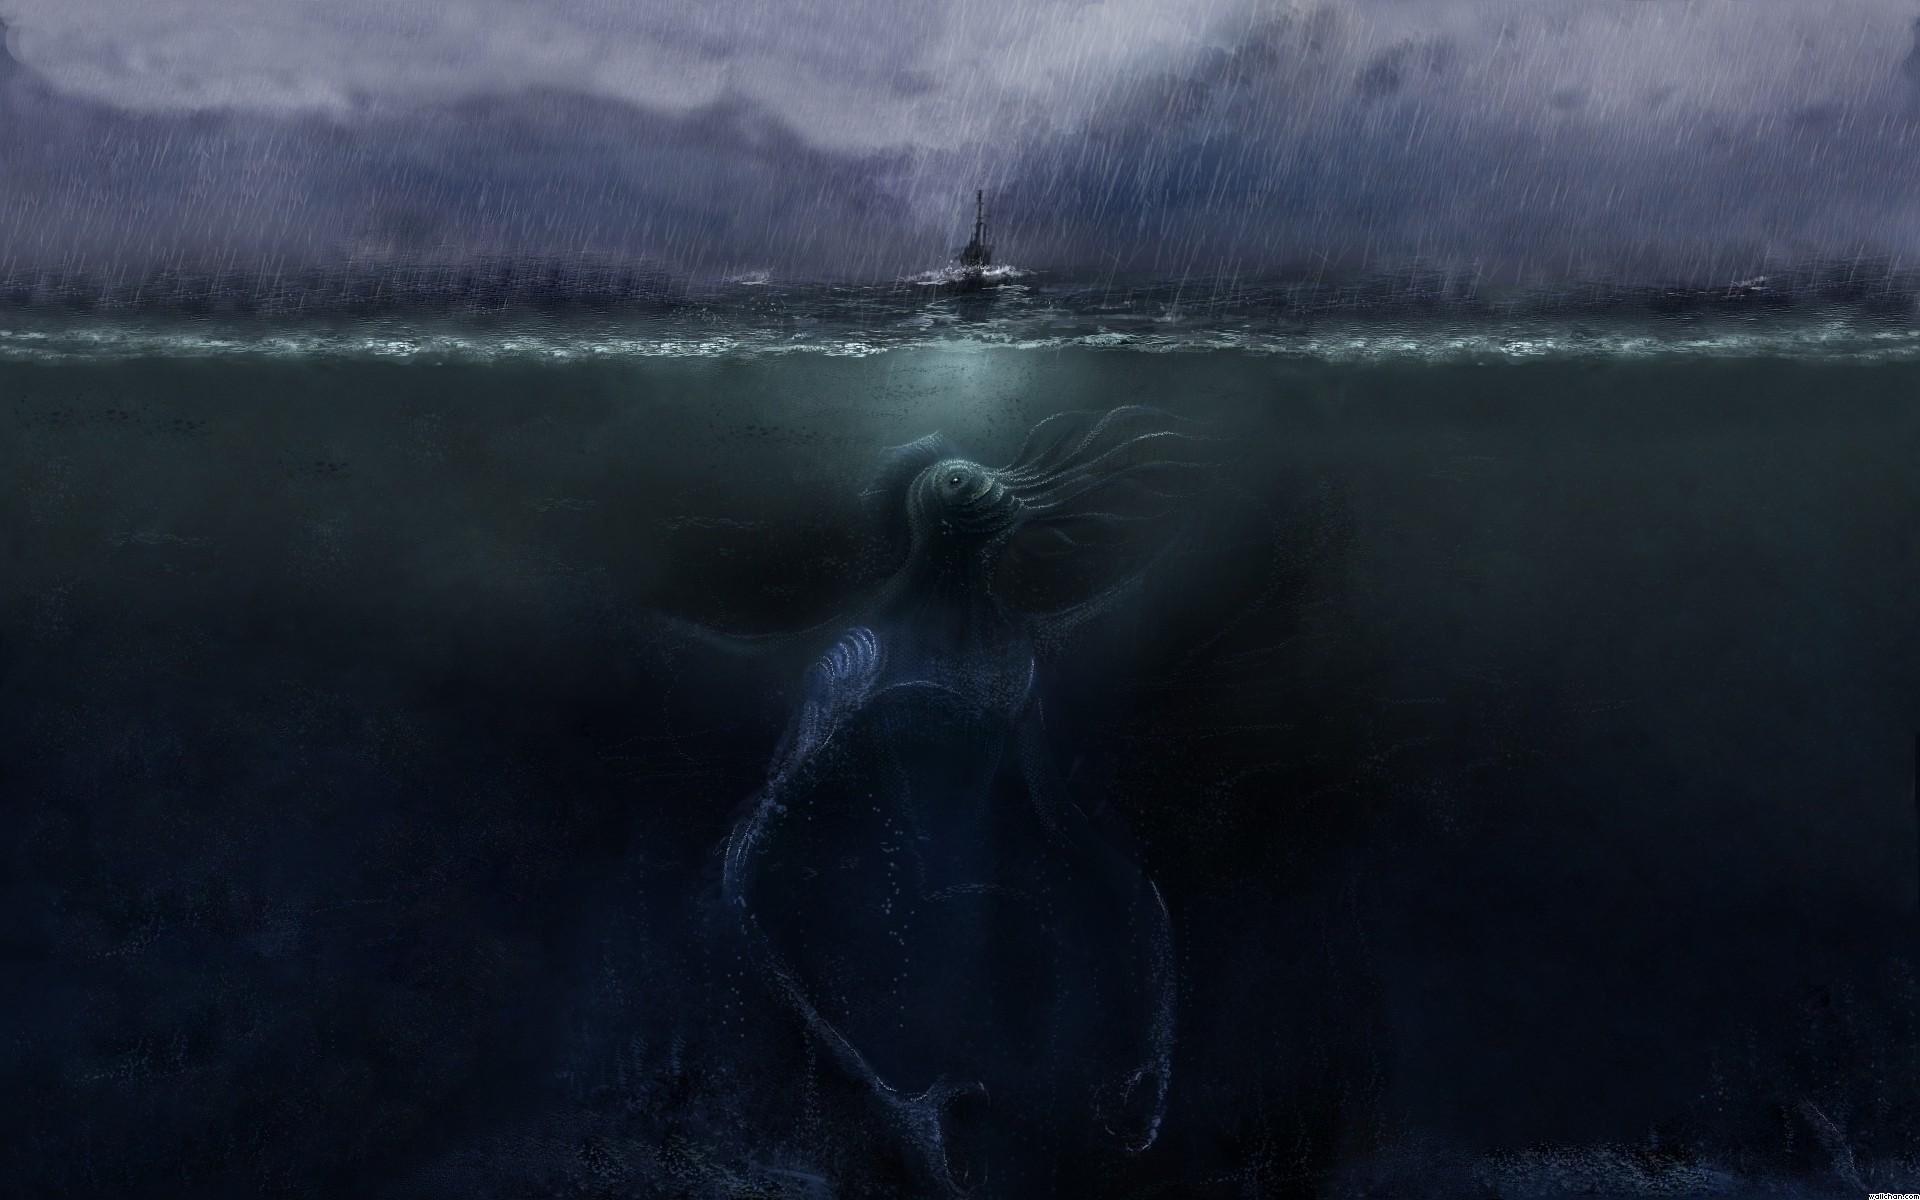 Wallpaper Digital Art Sea Monsters Water Reflection